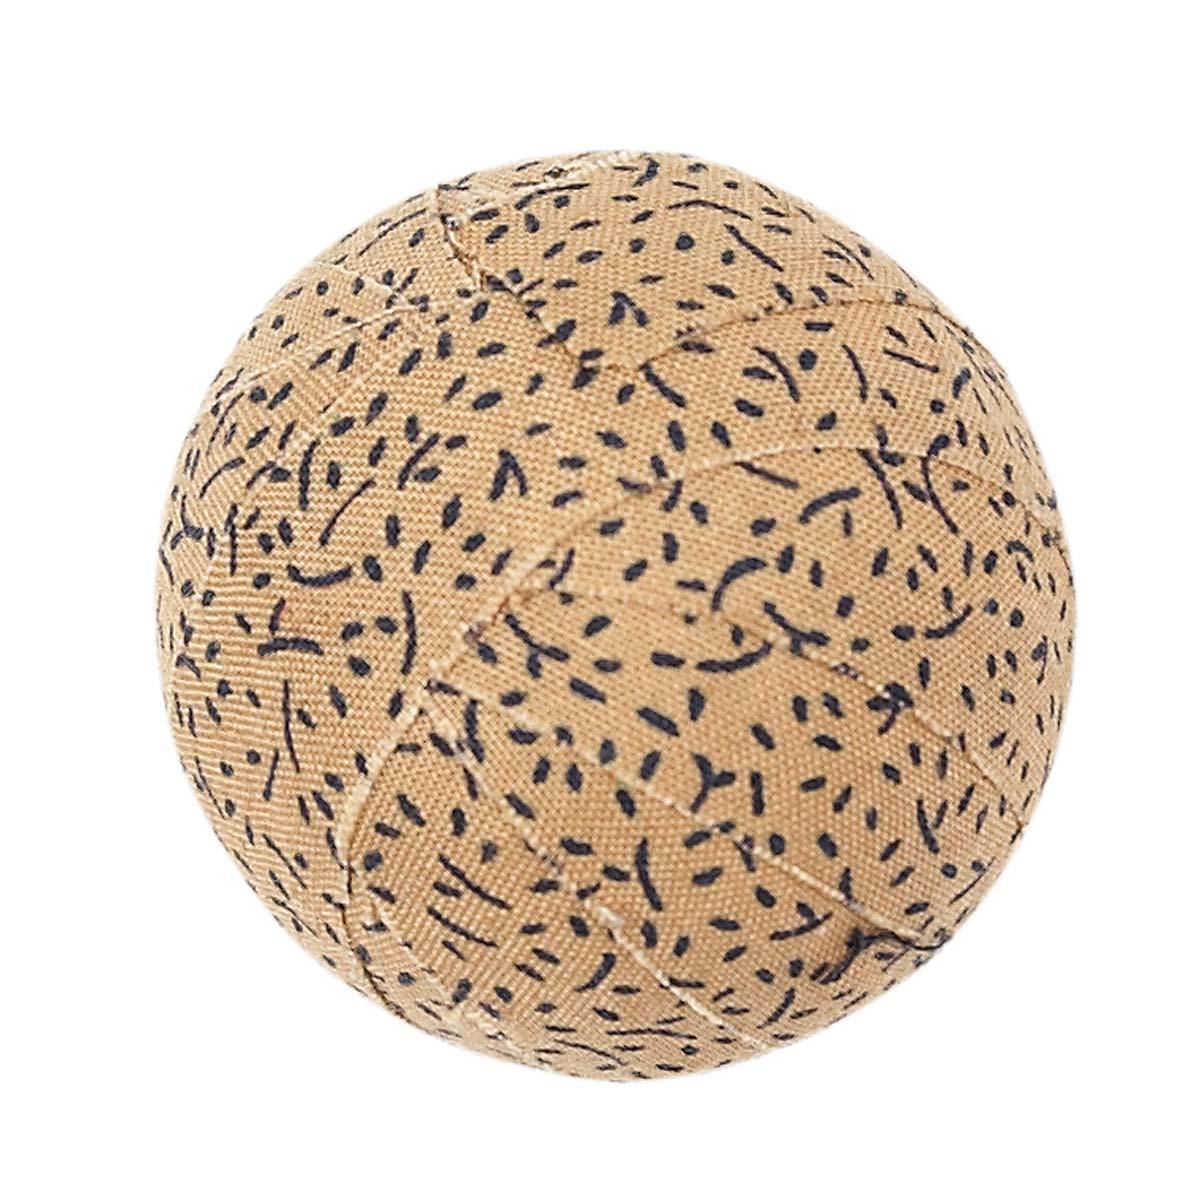 Millsboro Fabric Ball #1-1.5